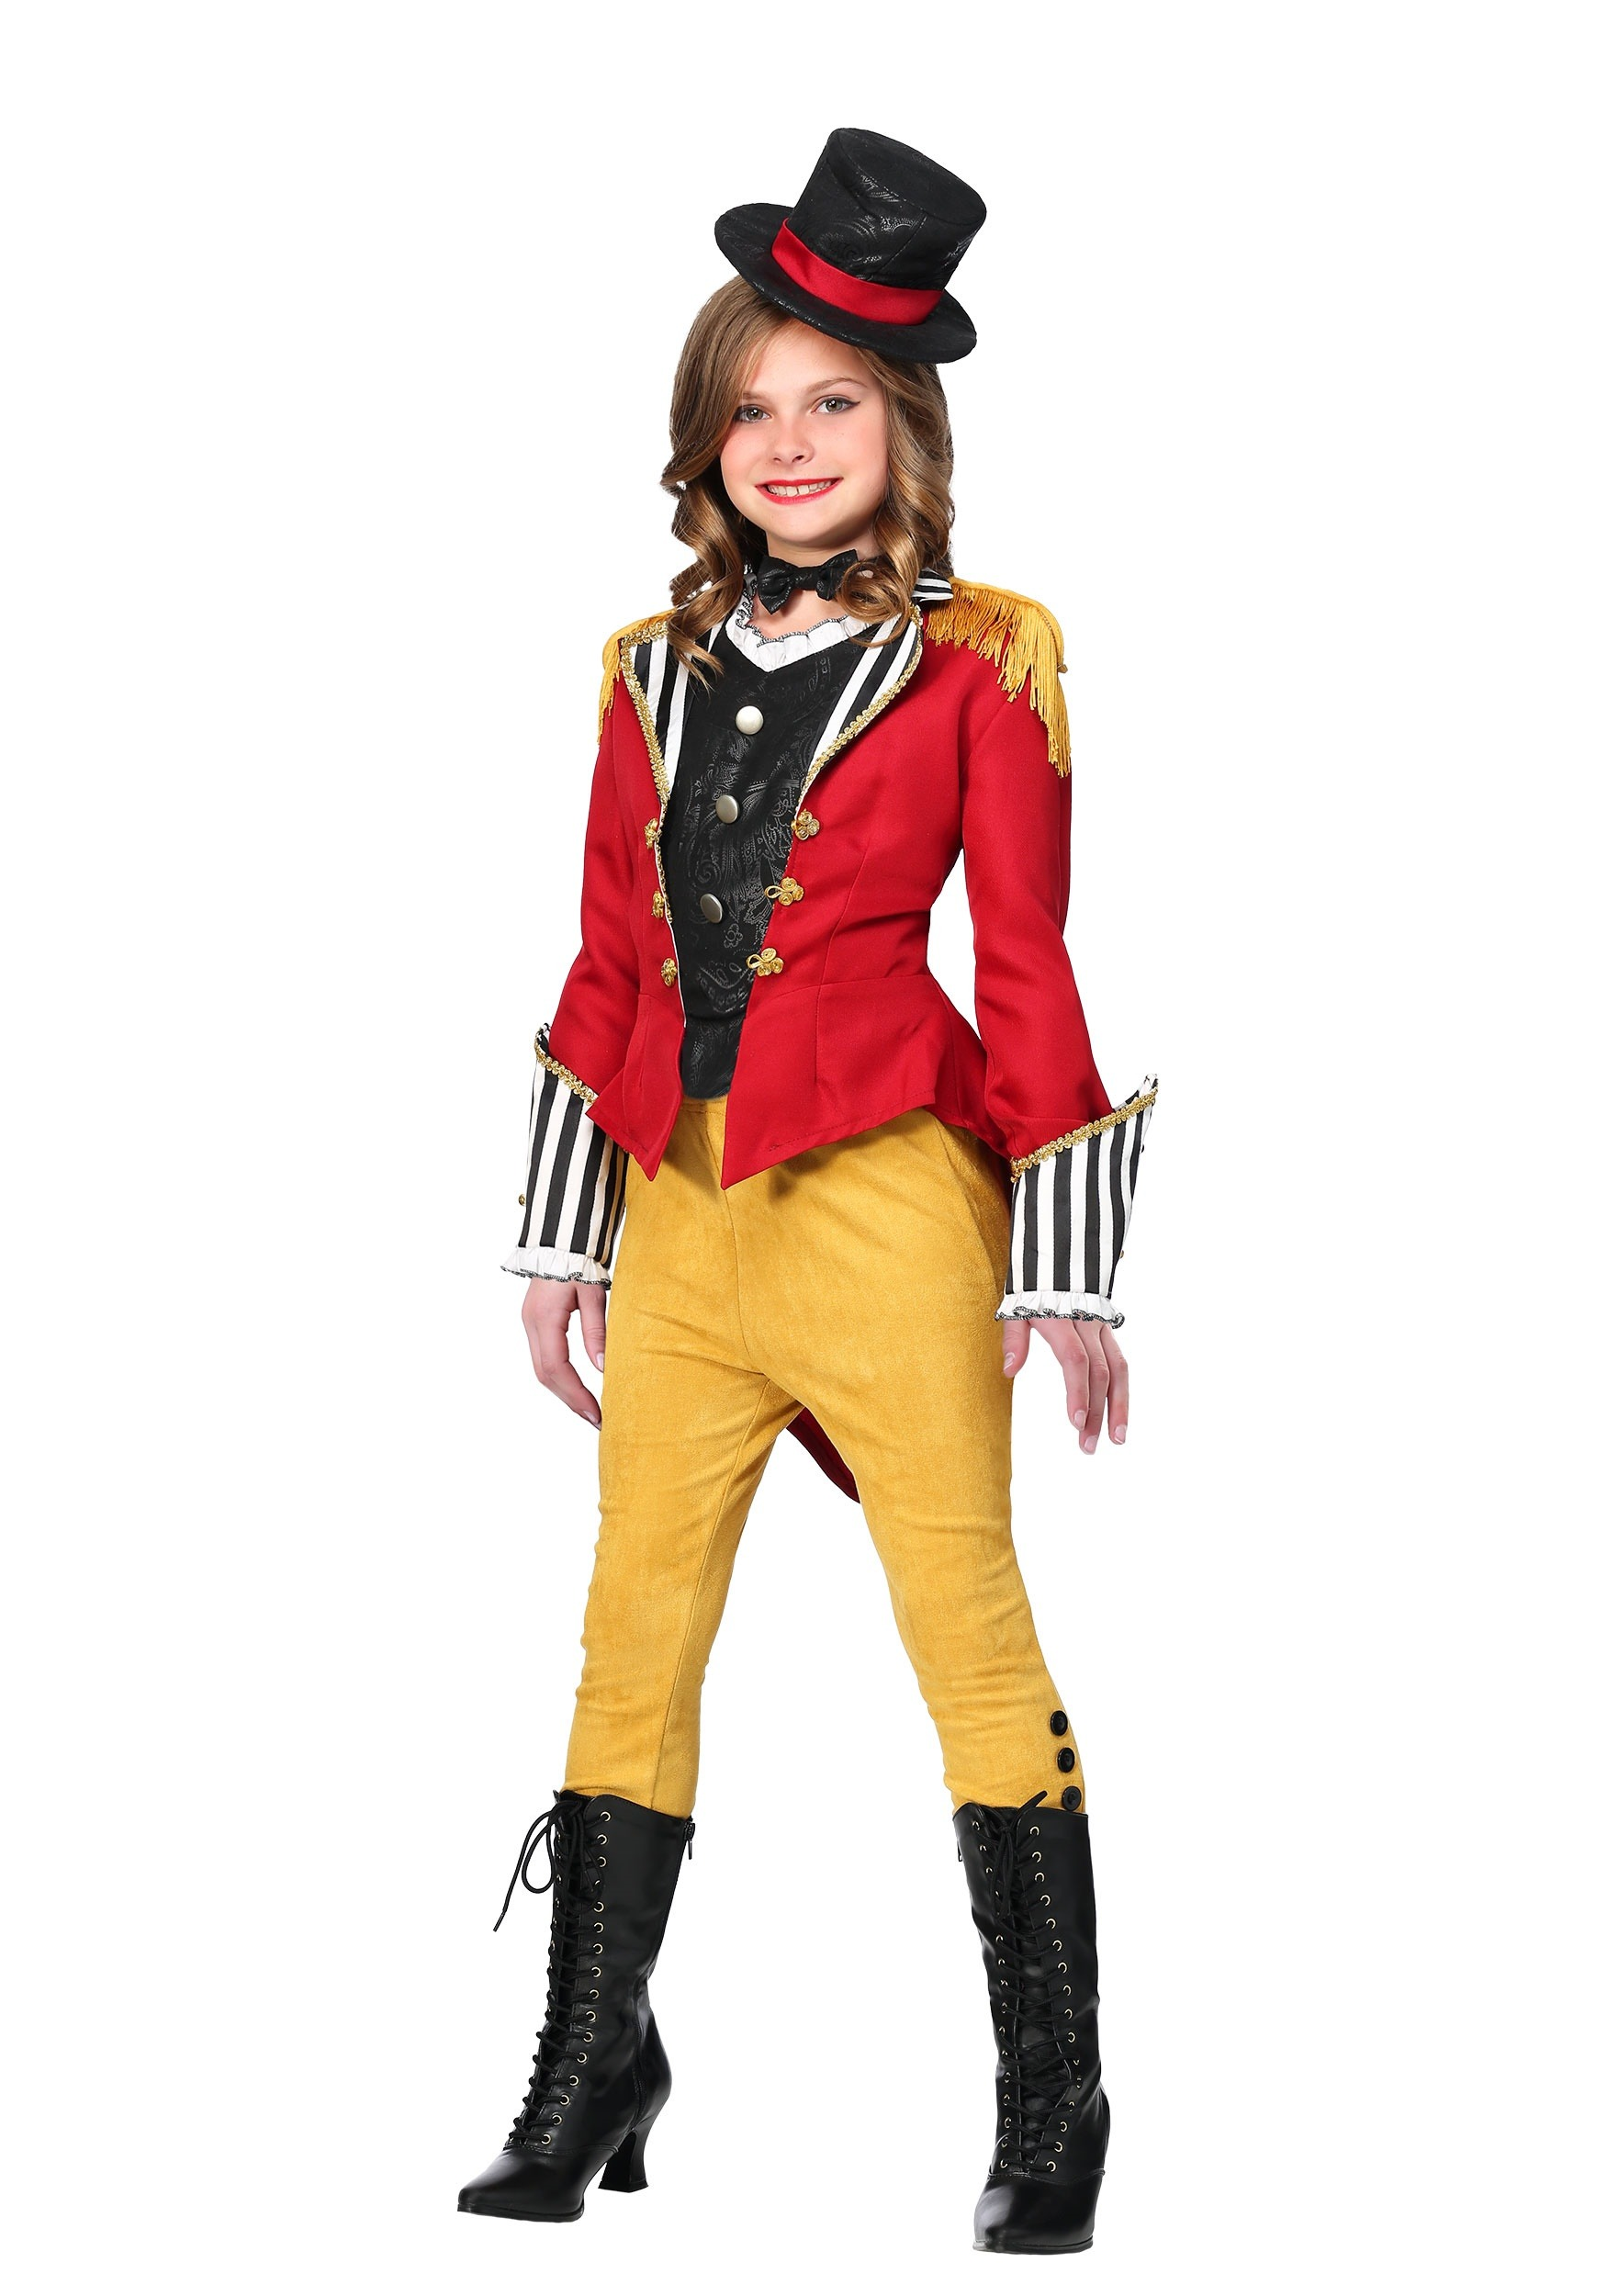 Ravishing Ringmaster Costume for Girls